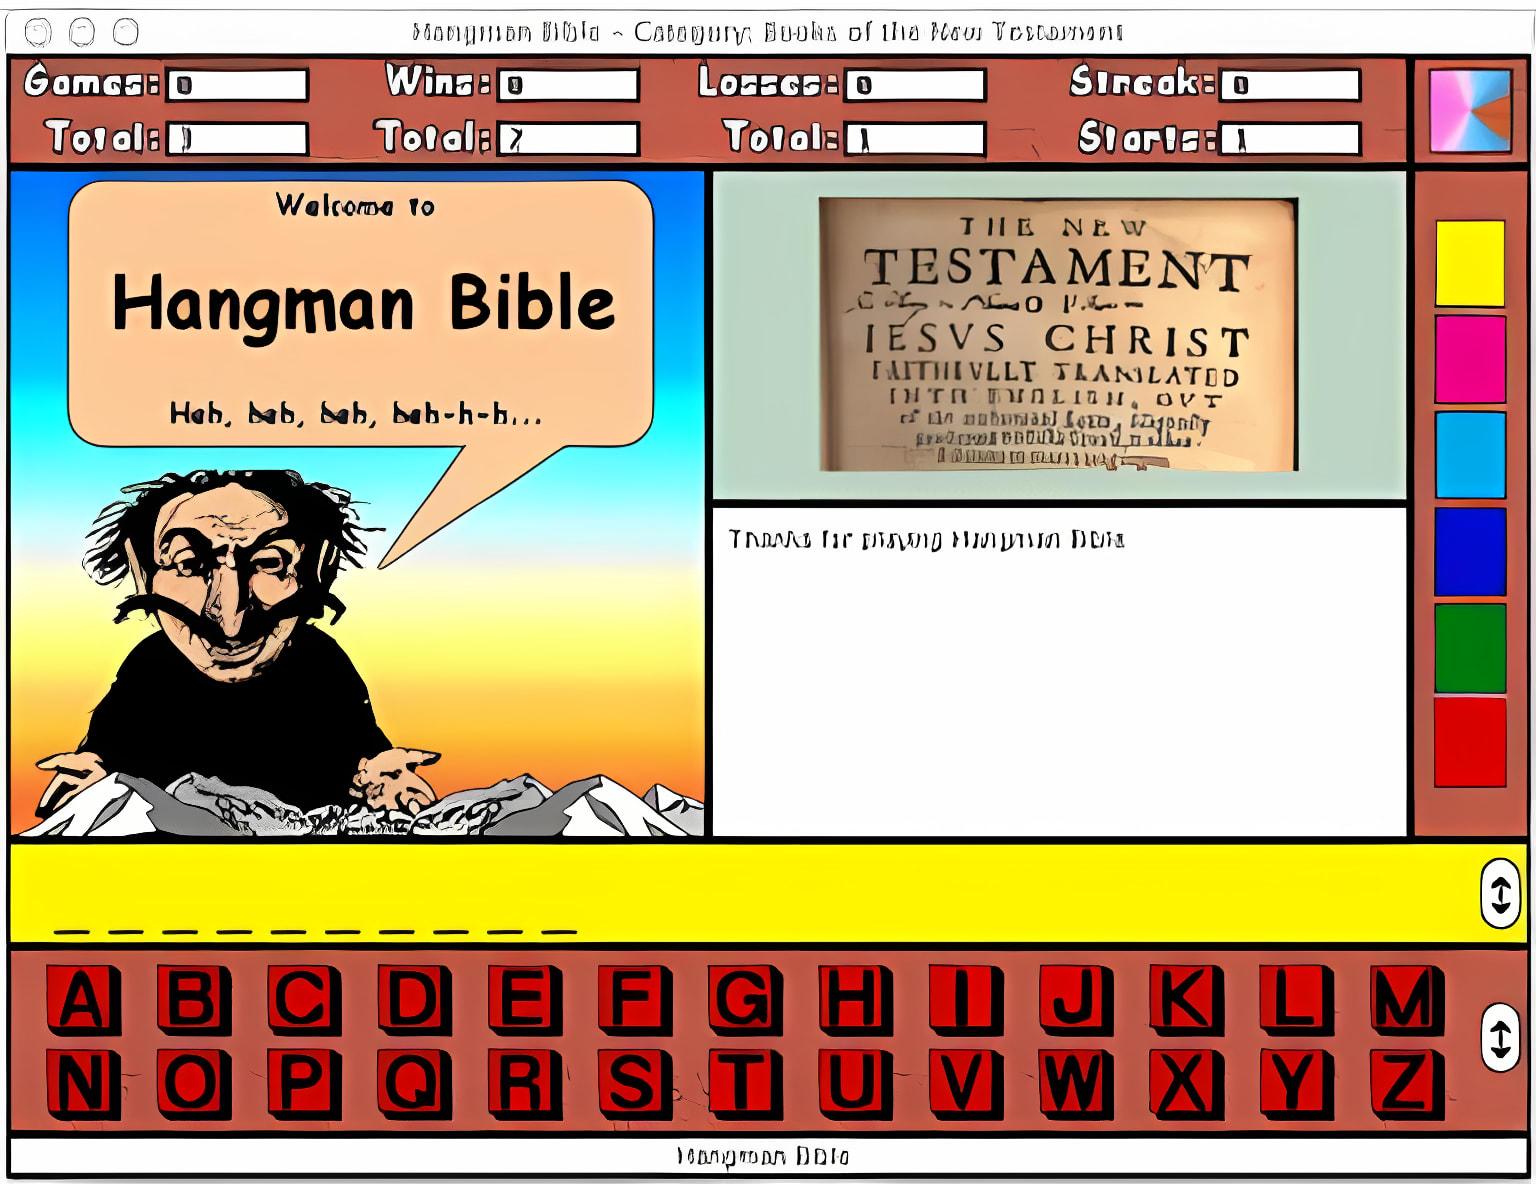 Hangman Bible